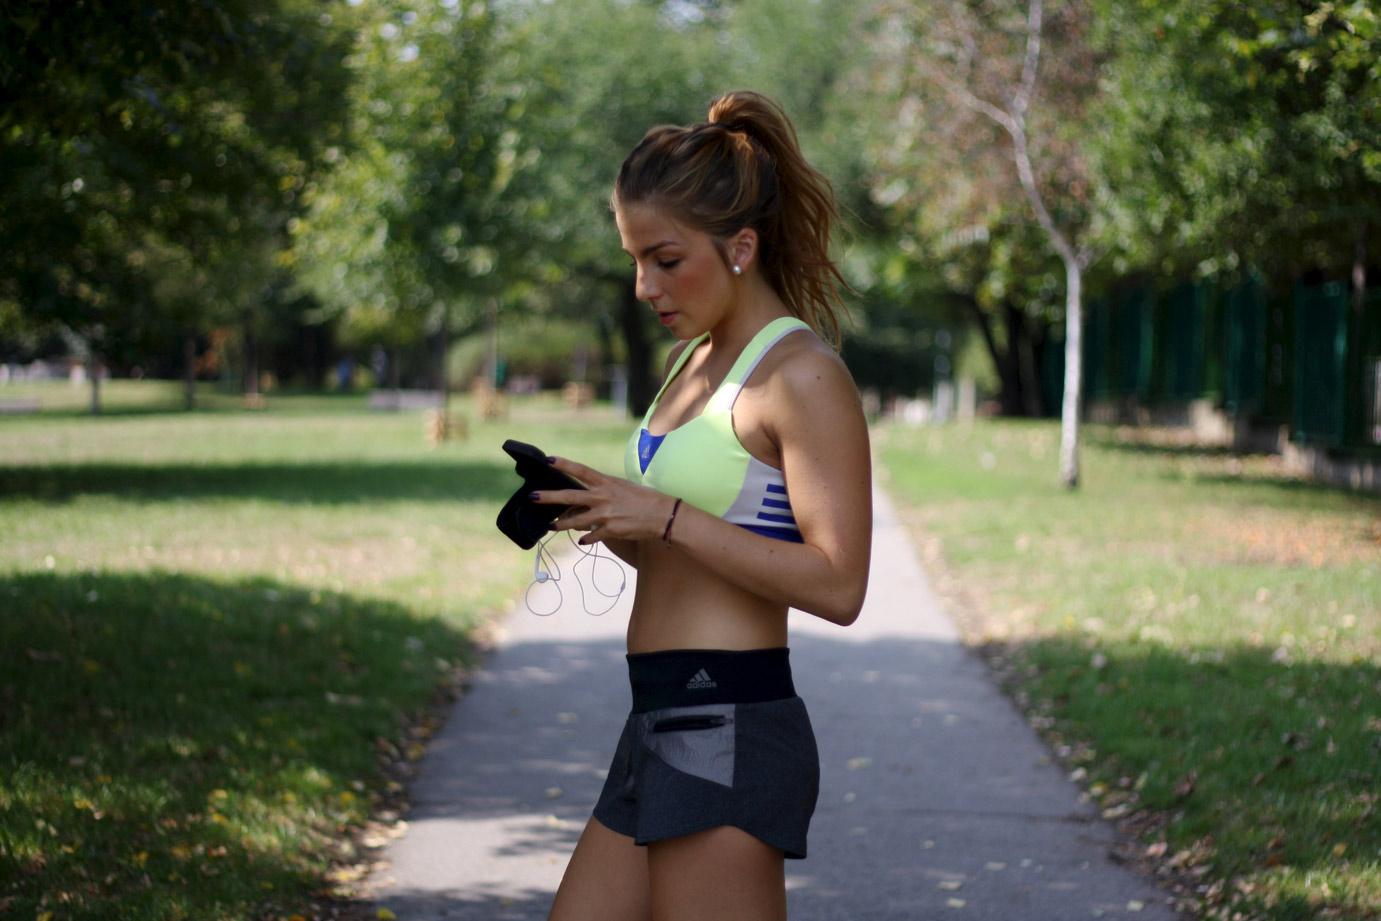 #ADIDASBLOGGERSCHALLENGE - THE BEST RUNNING OUTFIT 5